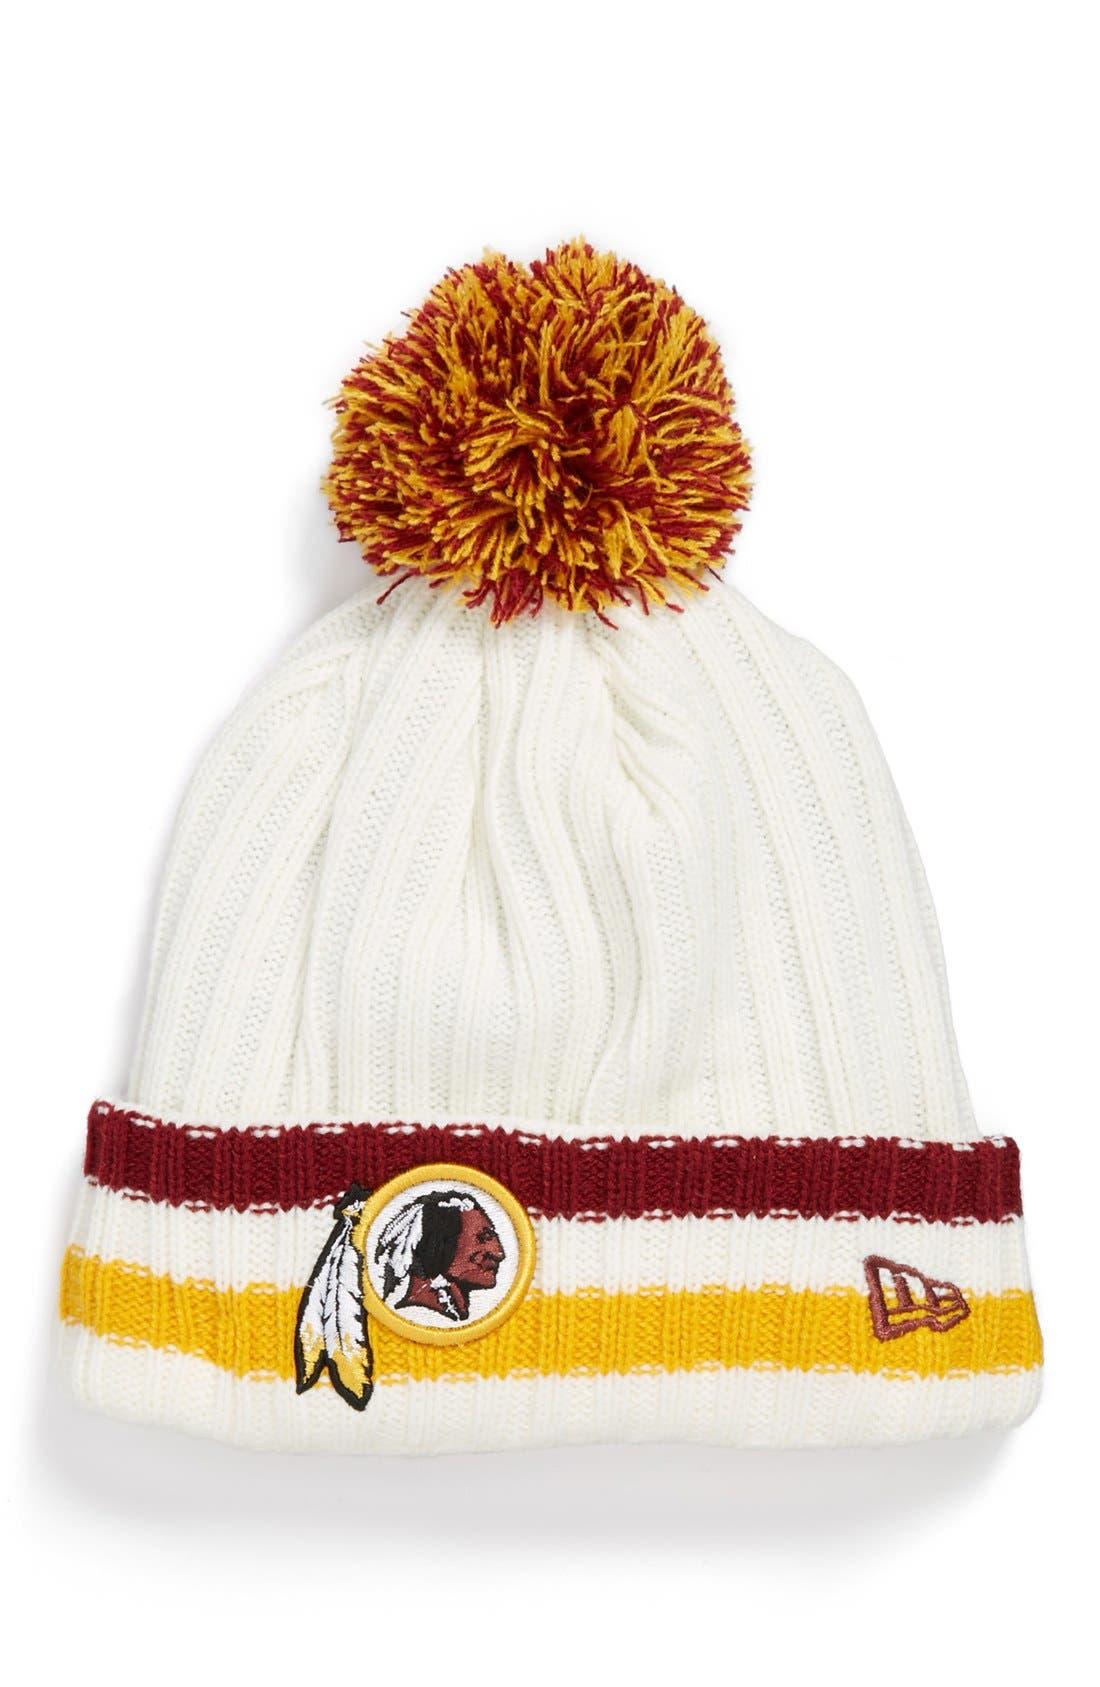 Main Image - New Era Cap 'Yesteryear - Washington Redskins' Knit Cap